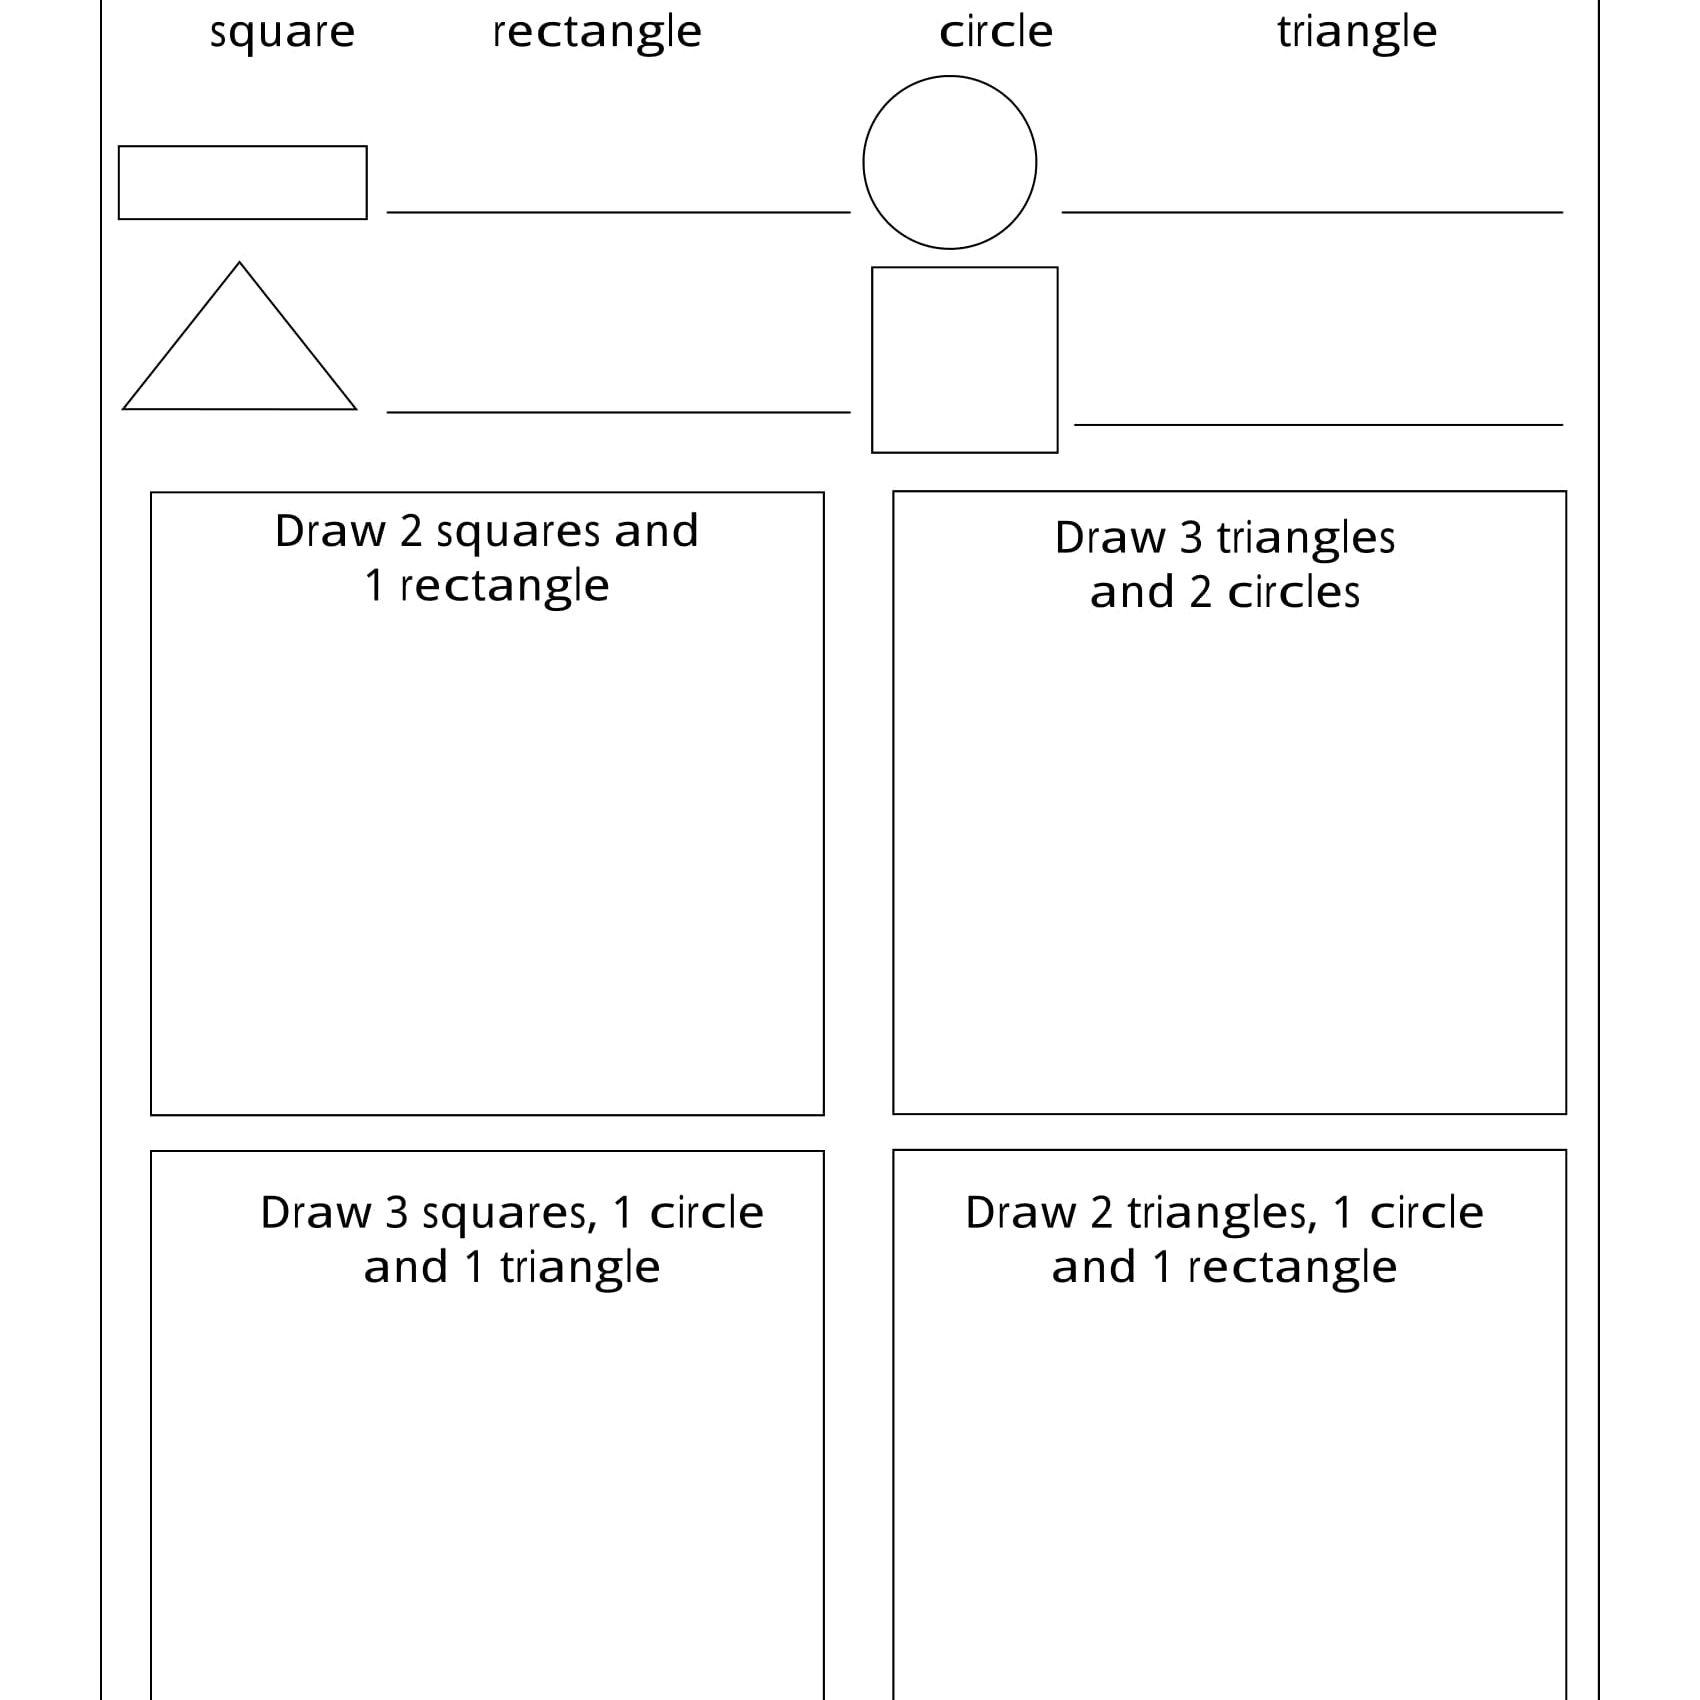 Geometry Worksheets For Students In 1St Grade | Free Printable Social Studies Worksheets For 1St Grade